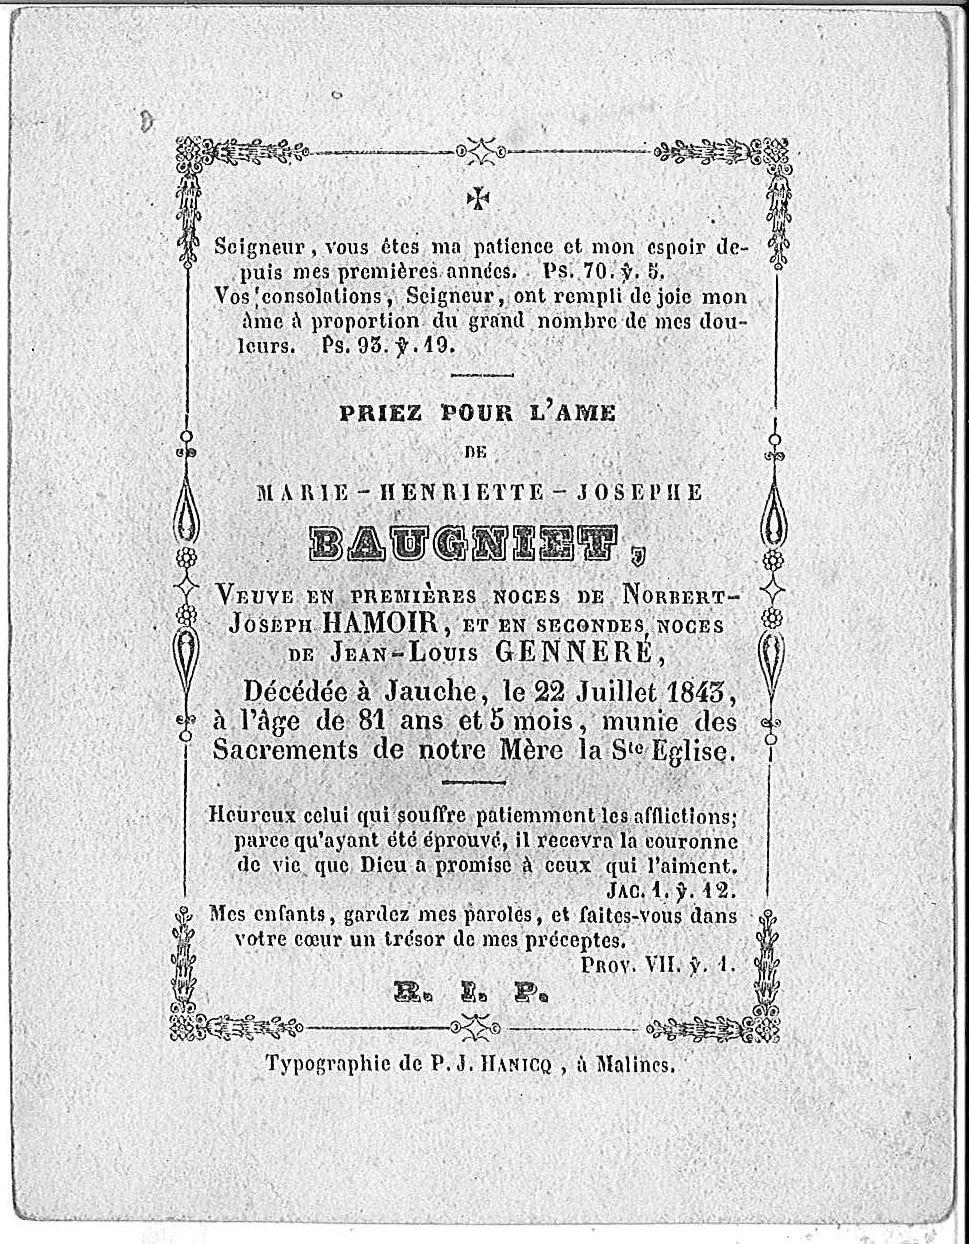 Marie-Henreitte-Josephe Baugniet